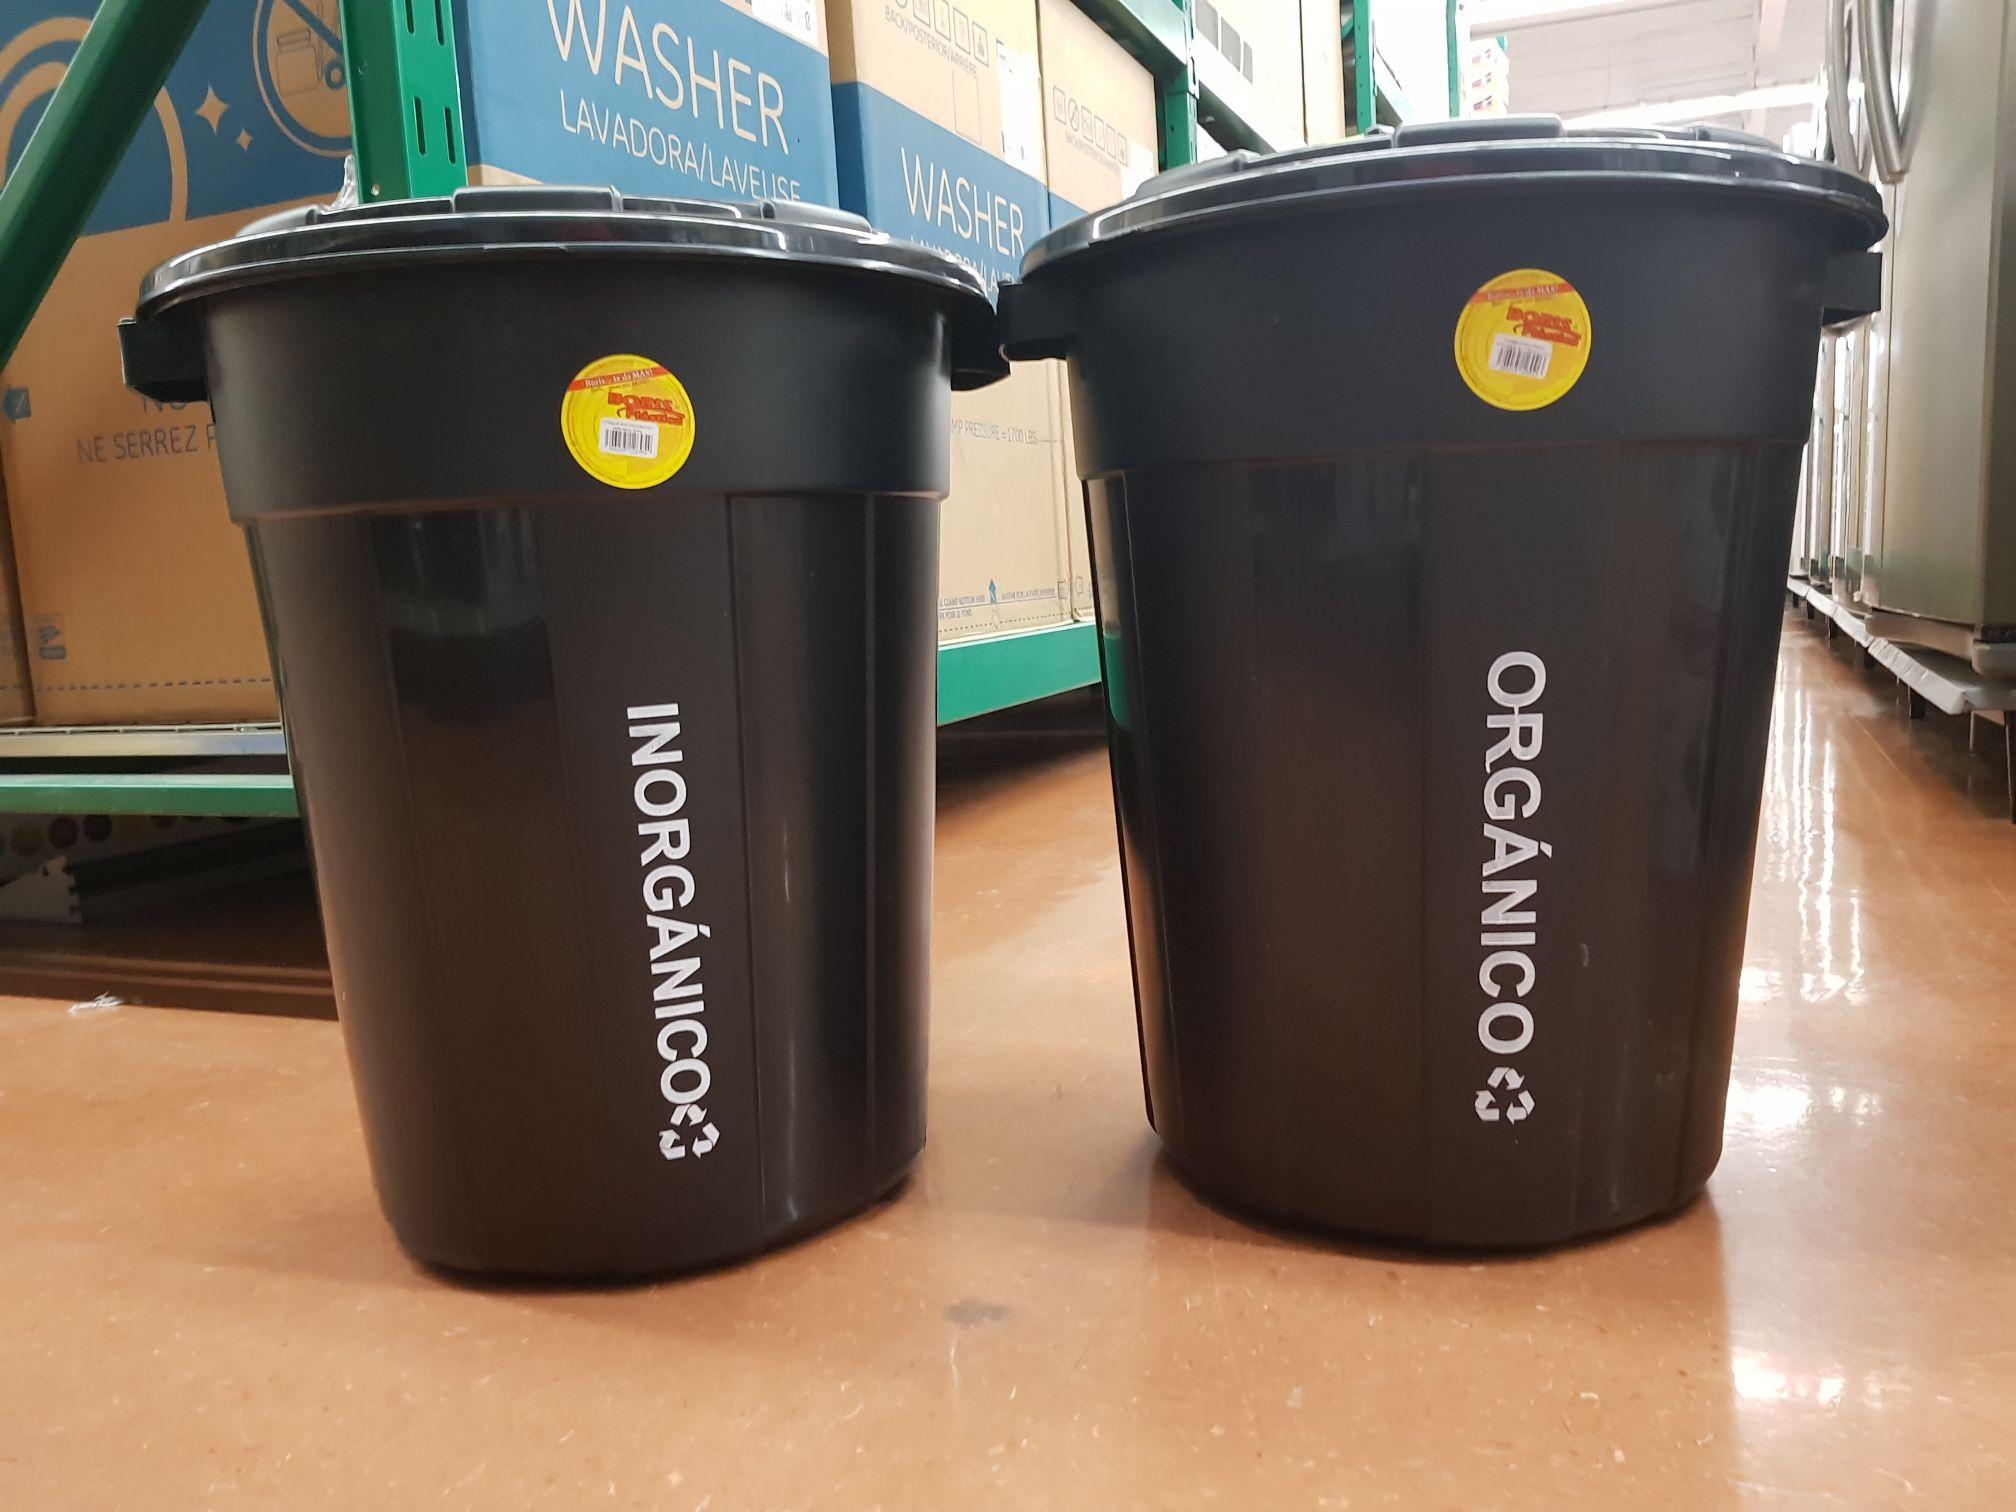 Walmart: Cesto de basura orgánico e inorgánico